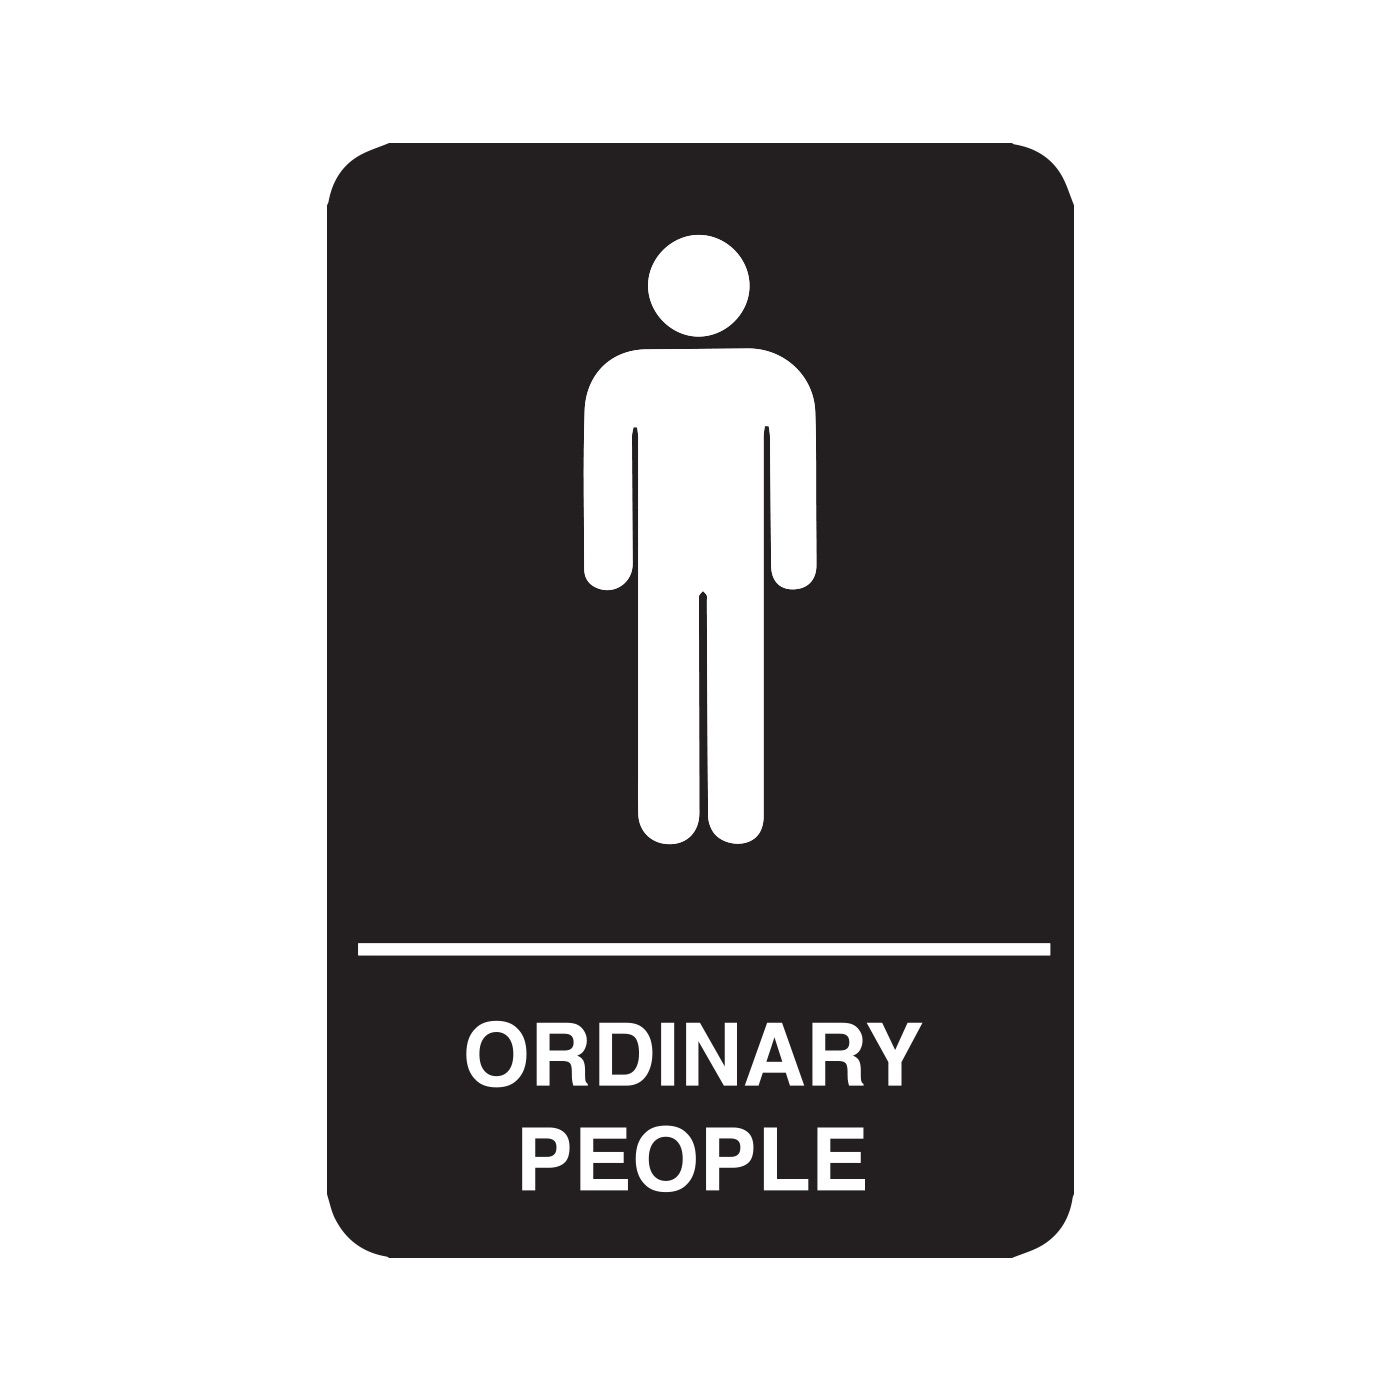 ORDINARY PEOPLE 001